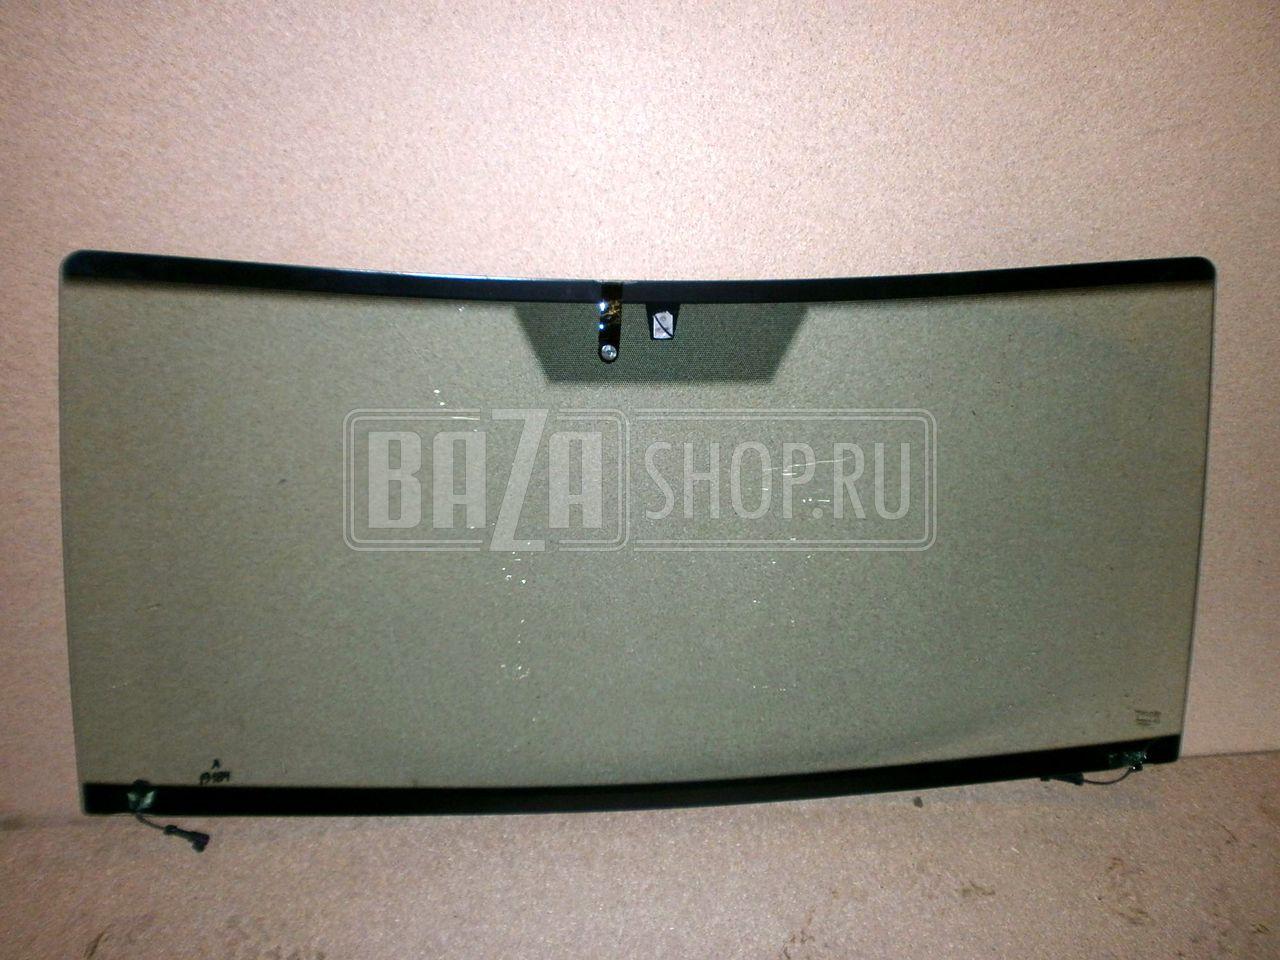 Лобовое стекло на уаз хантер  уфа